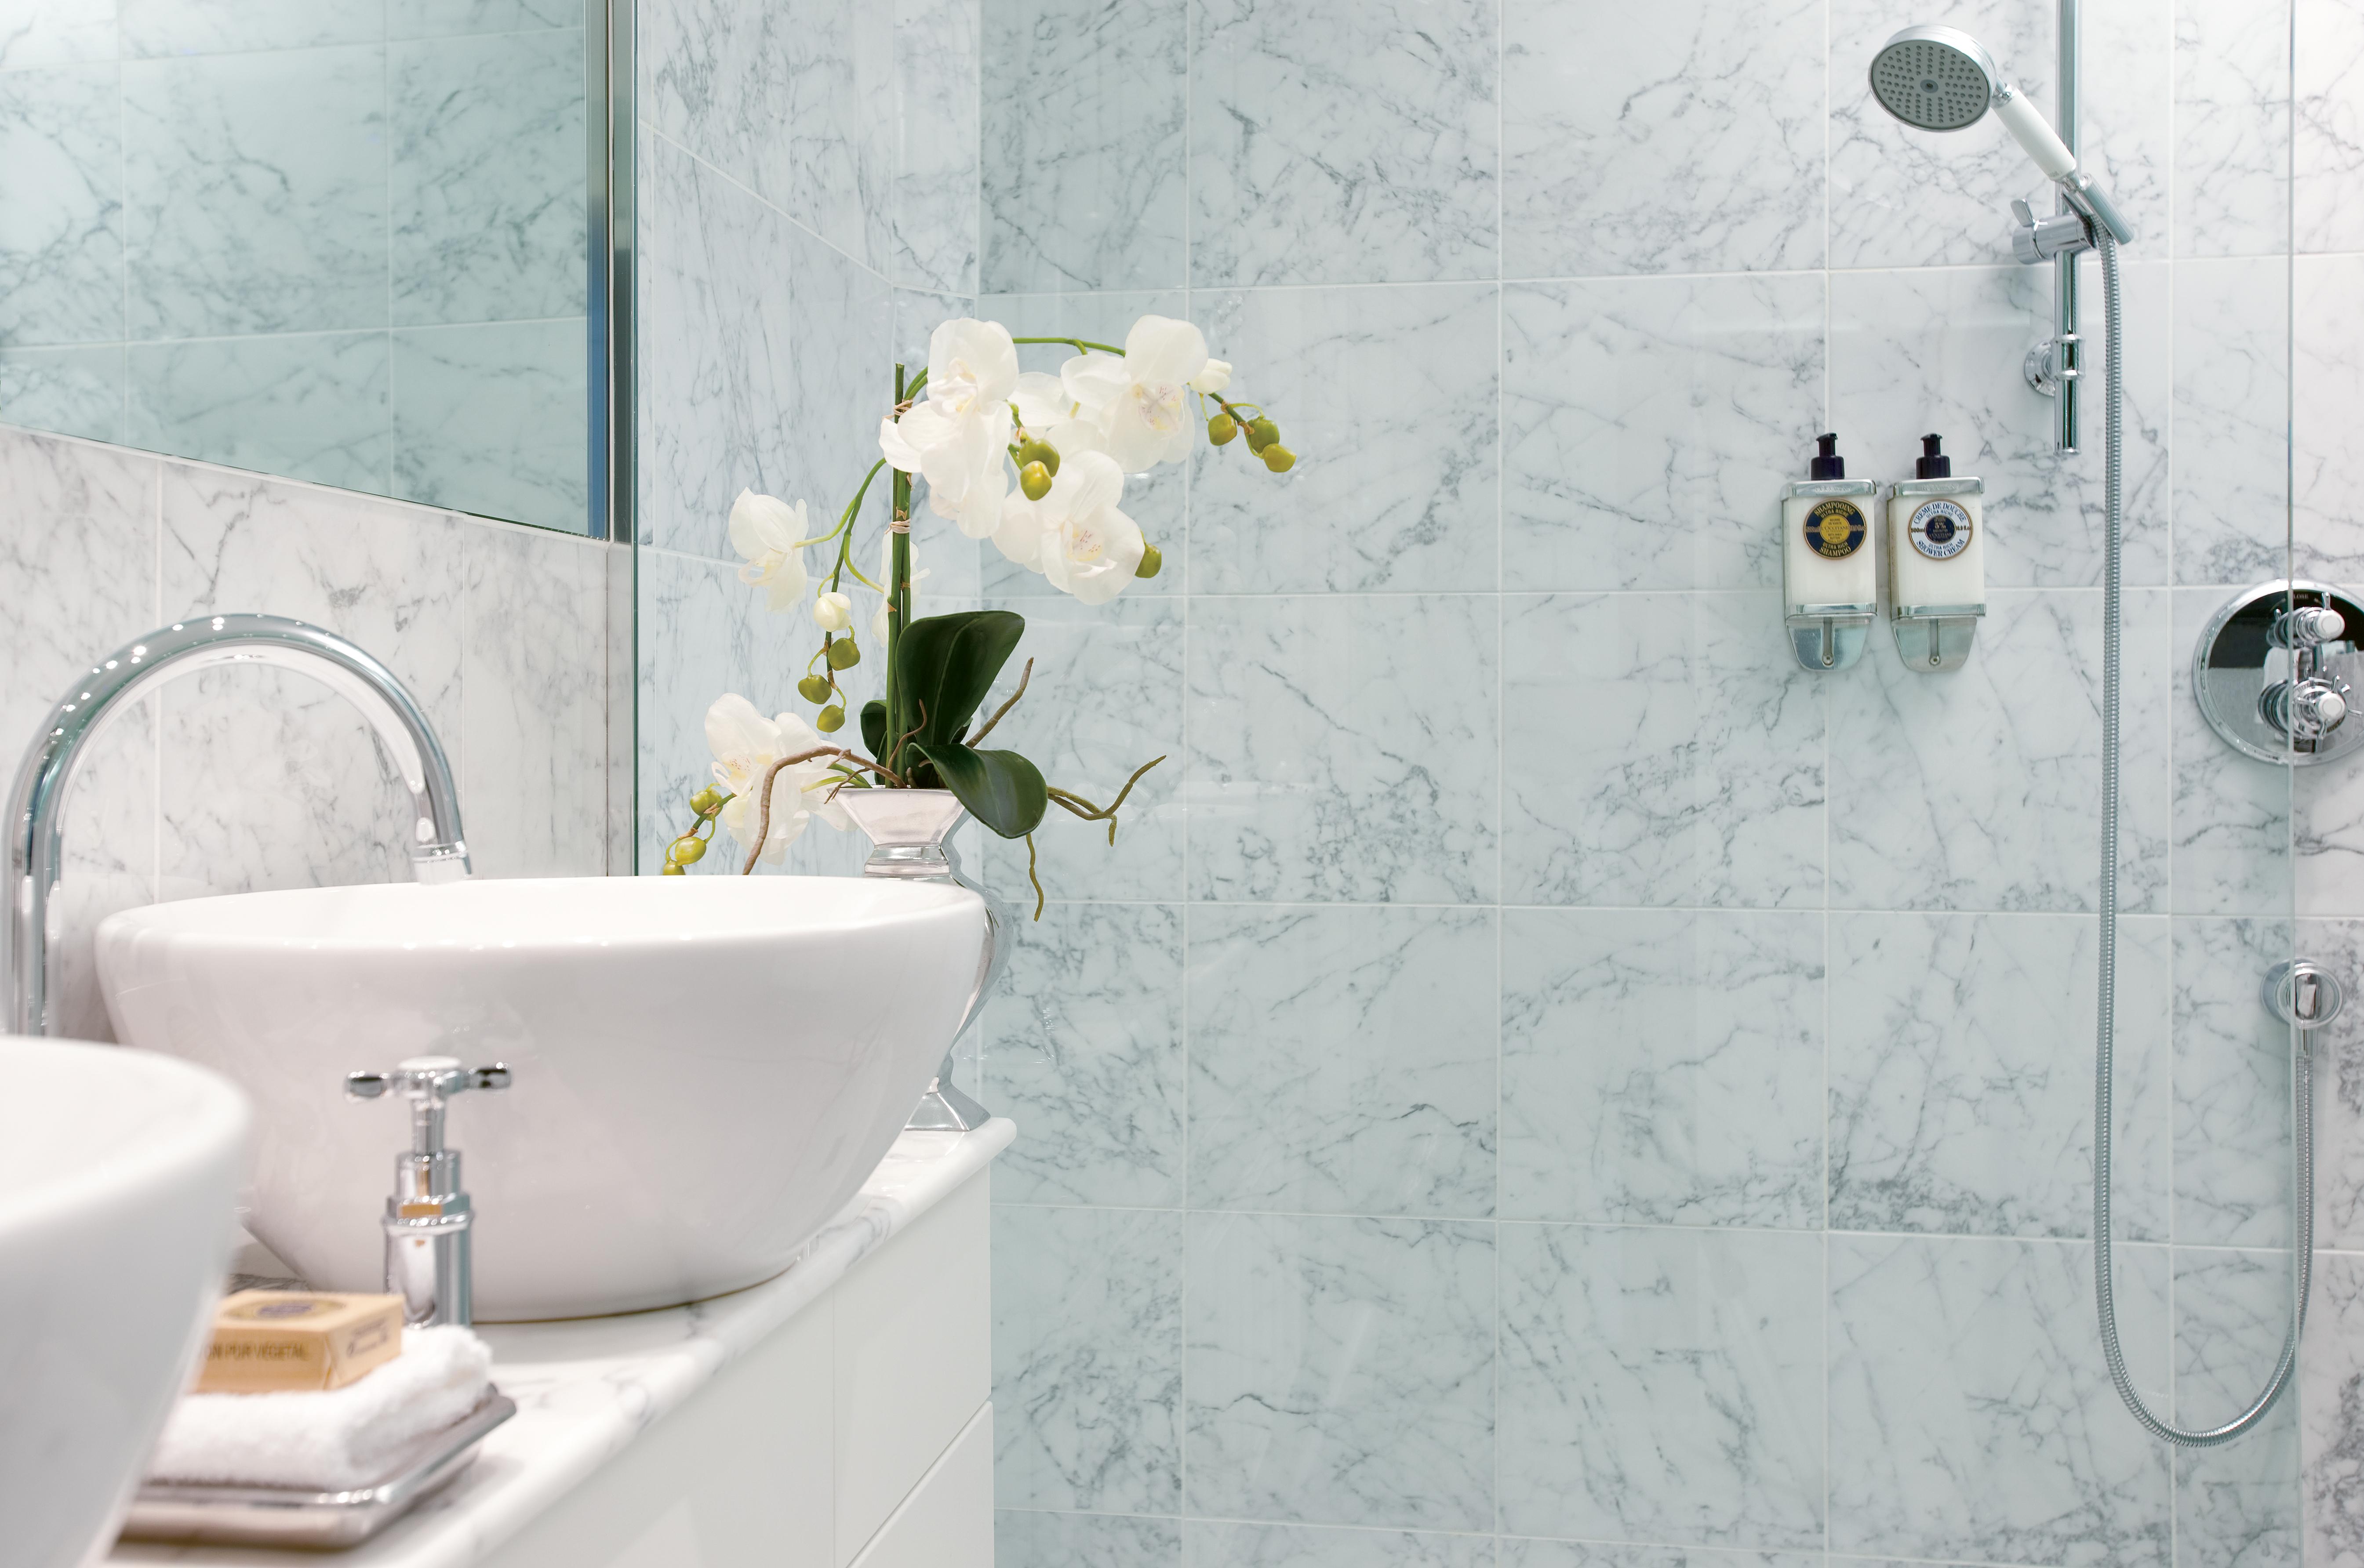 UNIWORLD Boutique River Cruises River Empress Accommodation Suite Bathroom.jpg